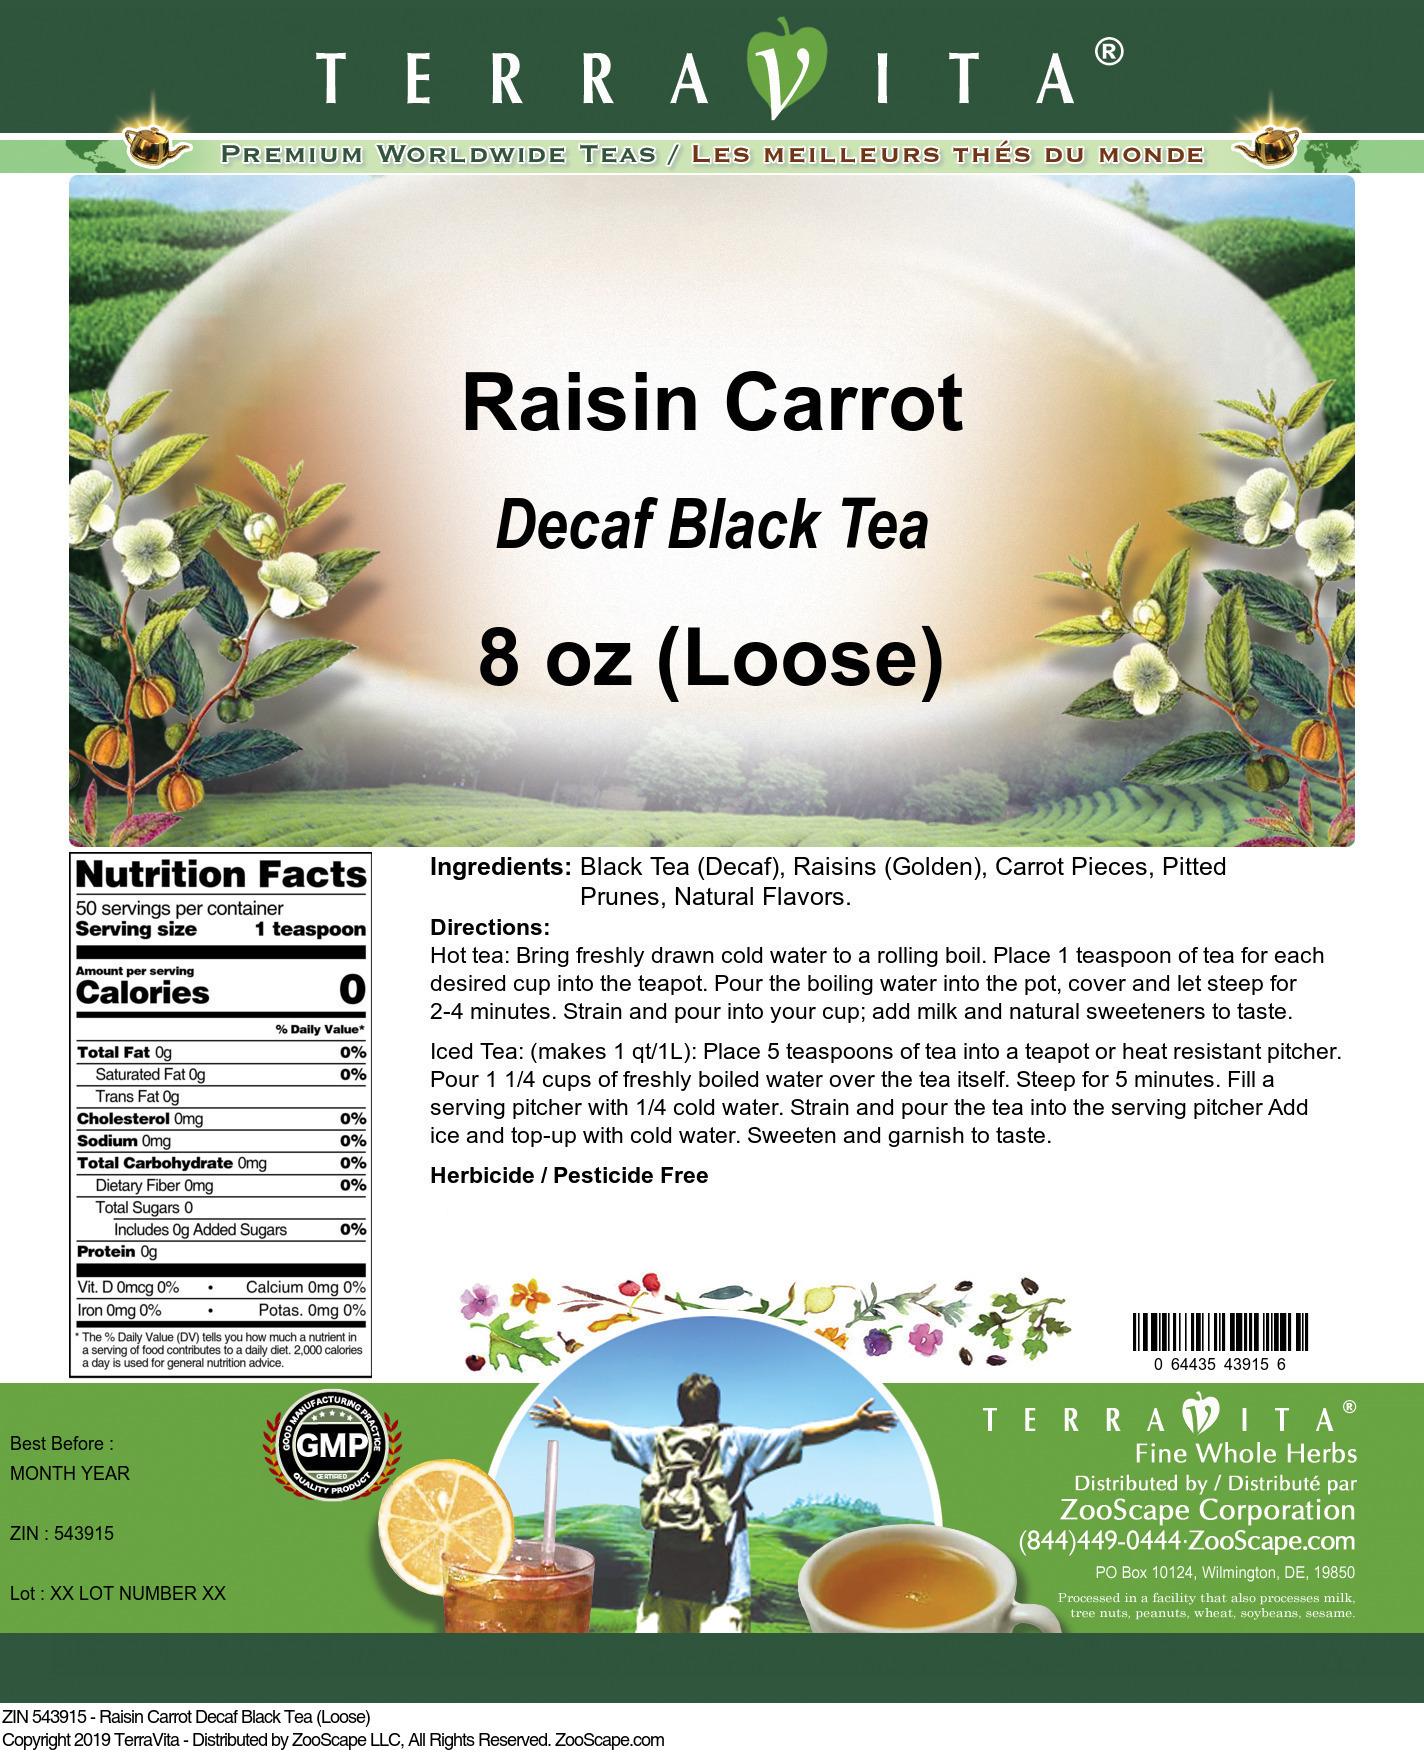 Raisin Carrot Decaf Black Tea (Loose)